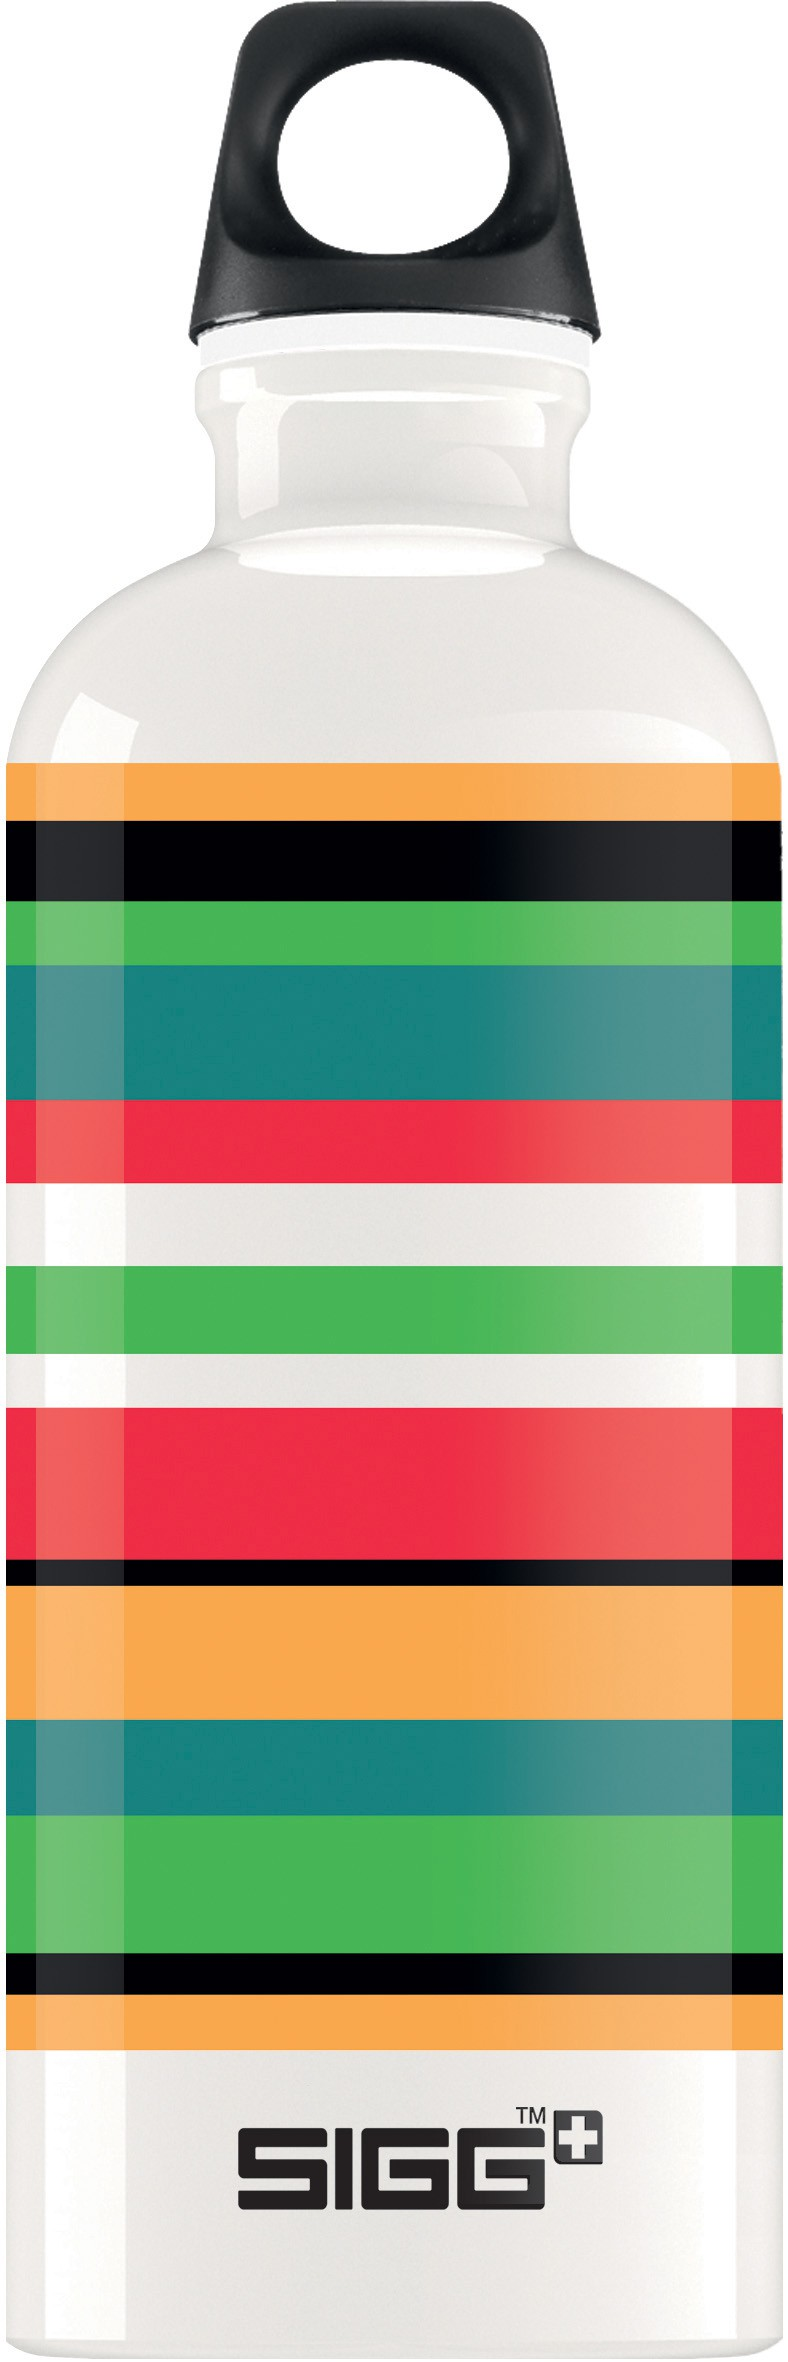 Láhev SIGG Stripes, 0,6l